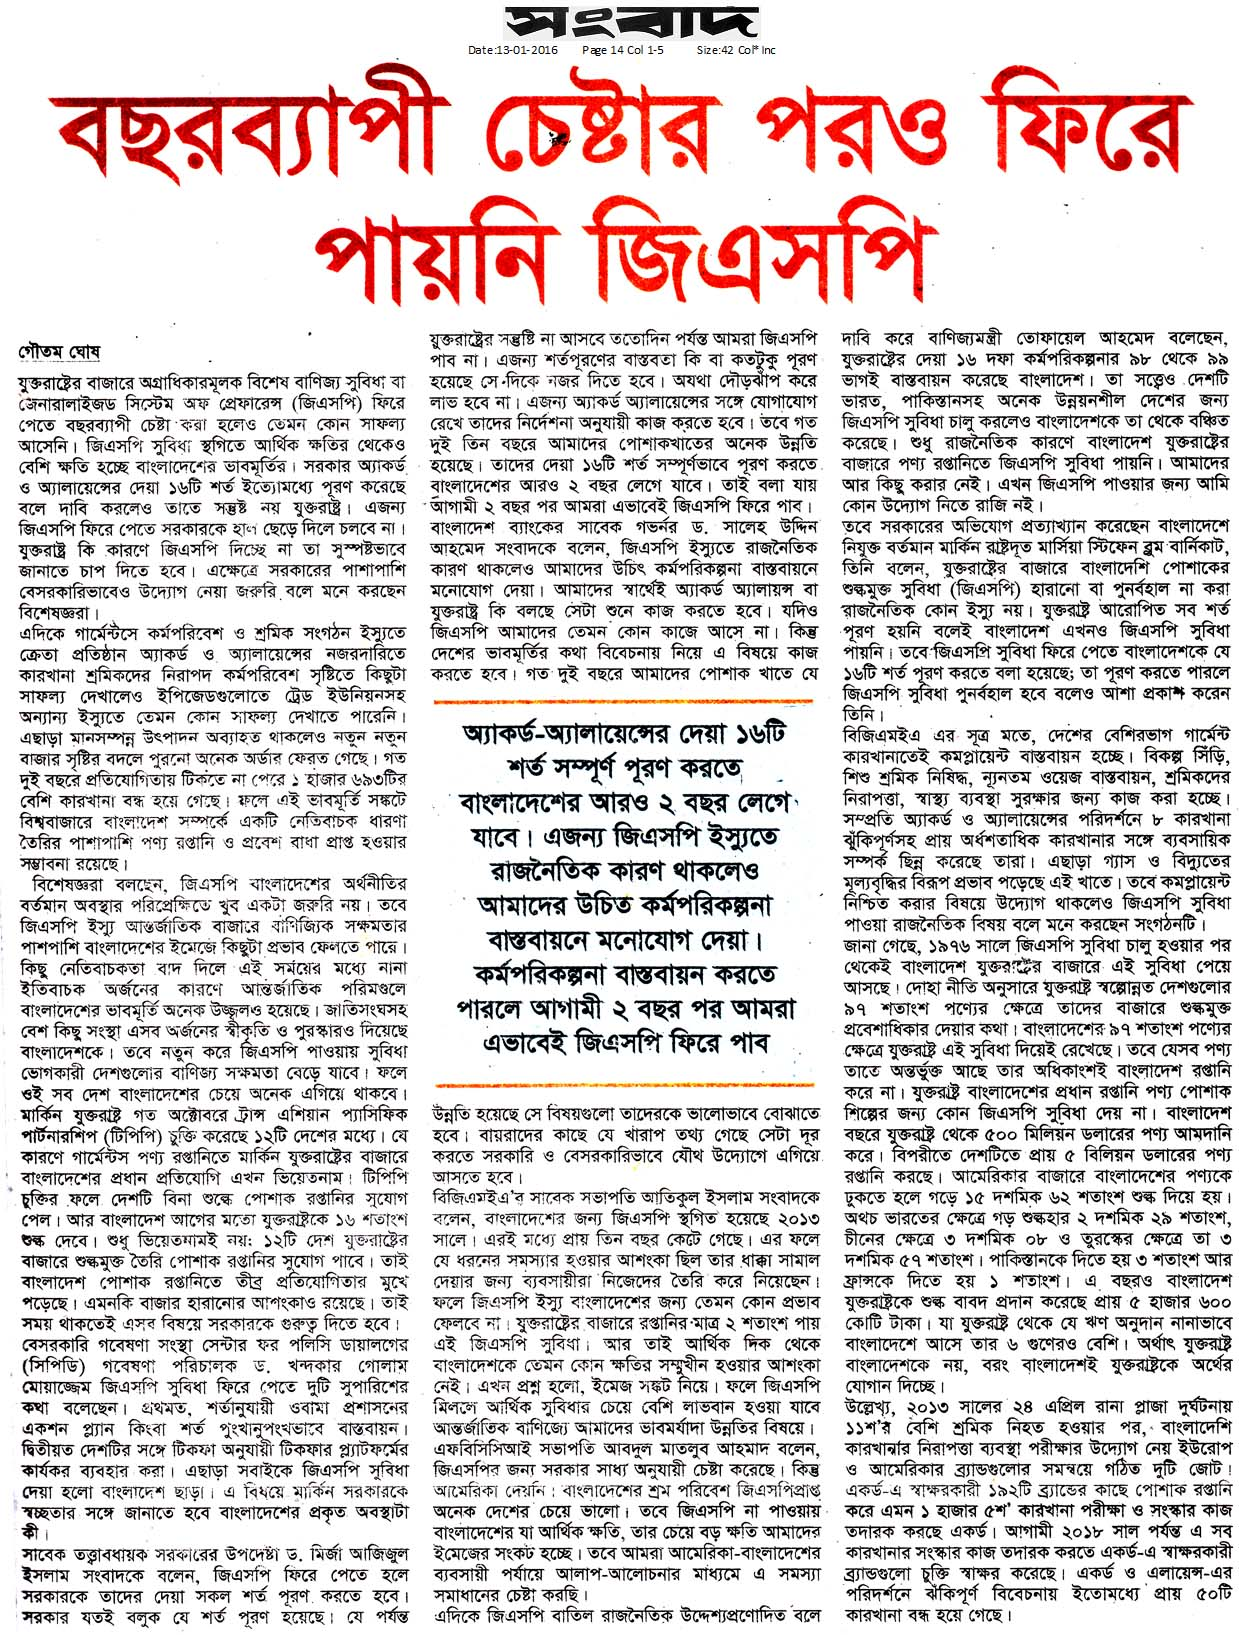 Sangbad, Page 14, January 13, 2016